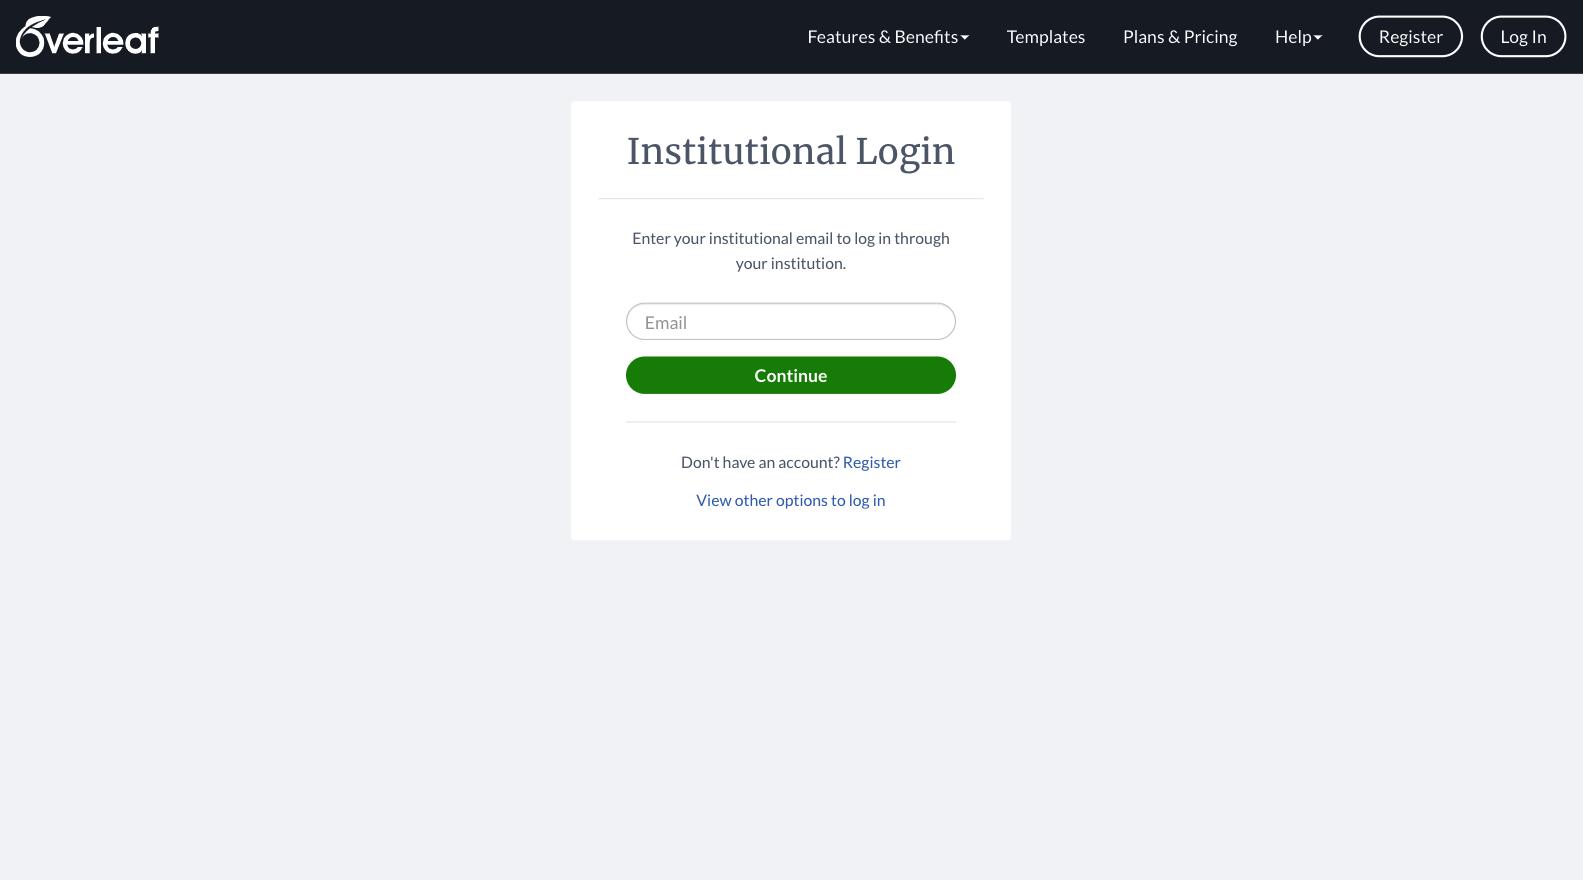 Overleaf institutional login